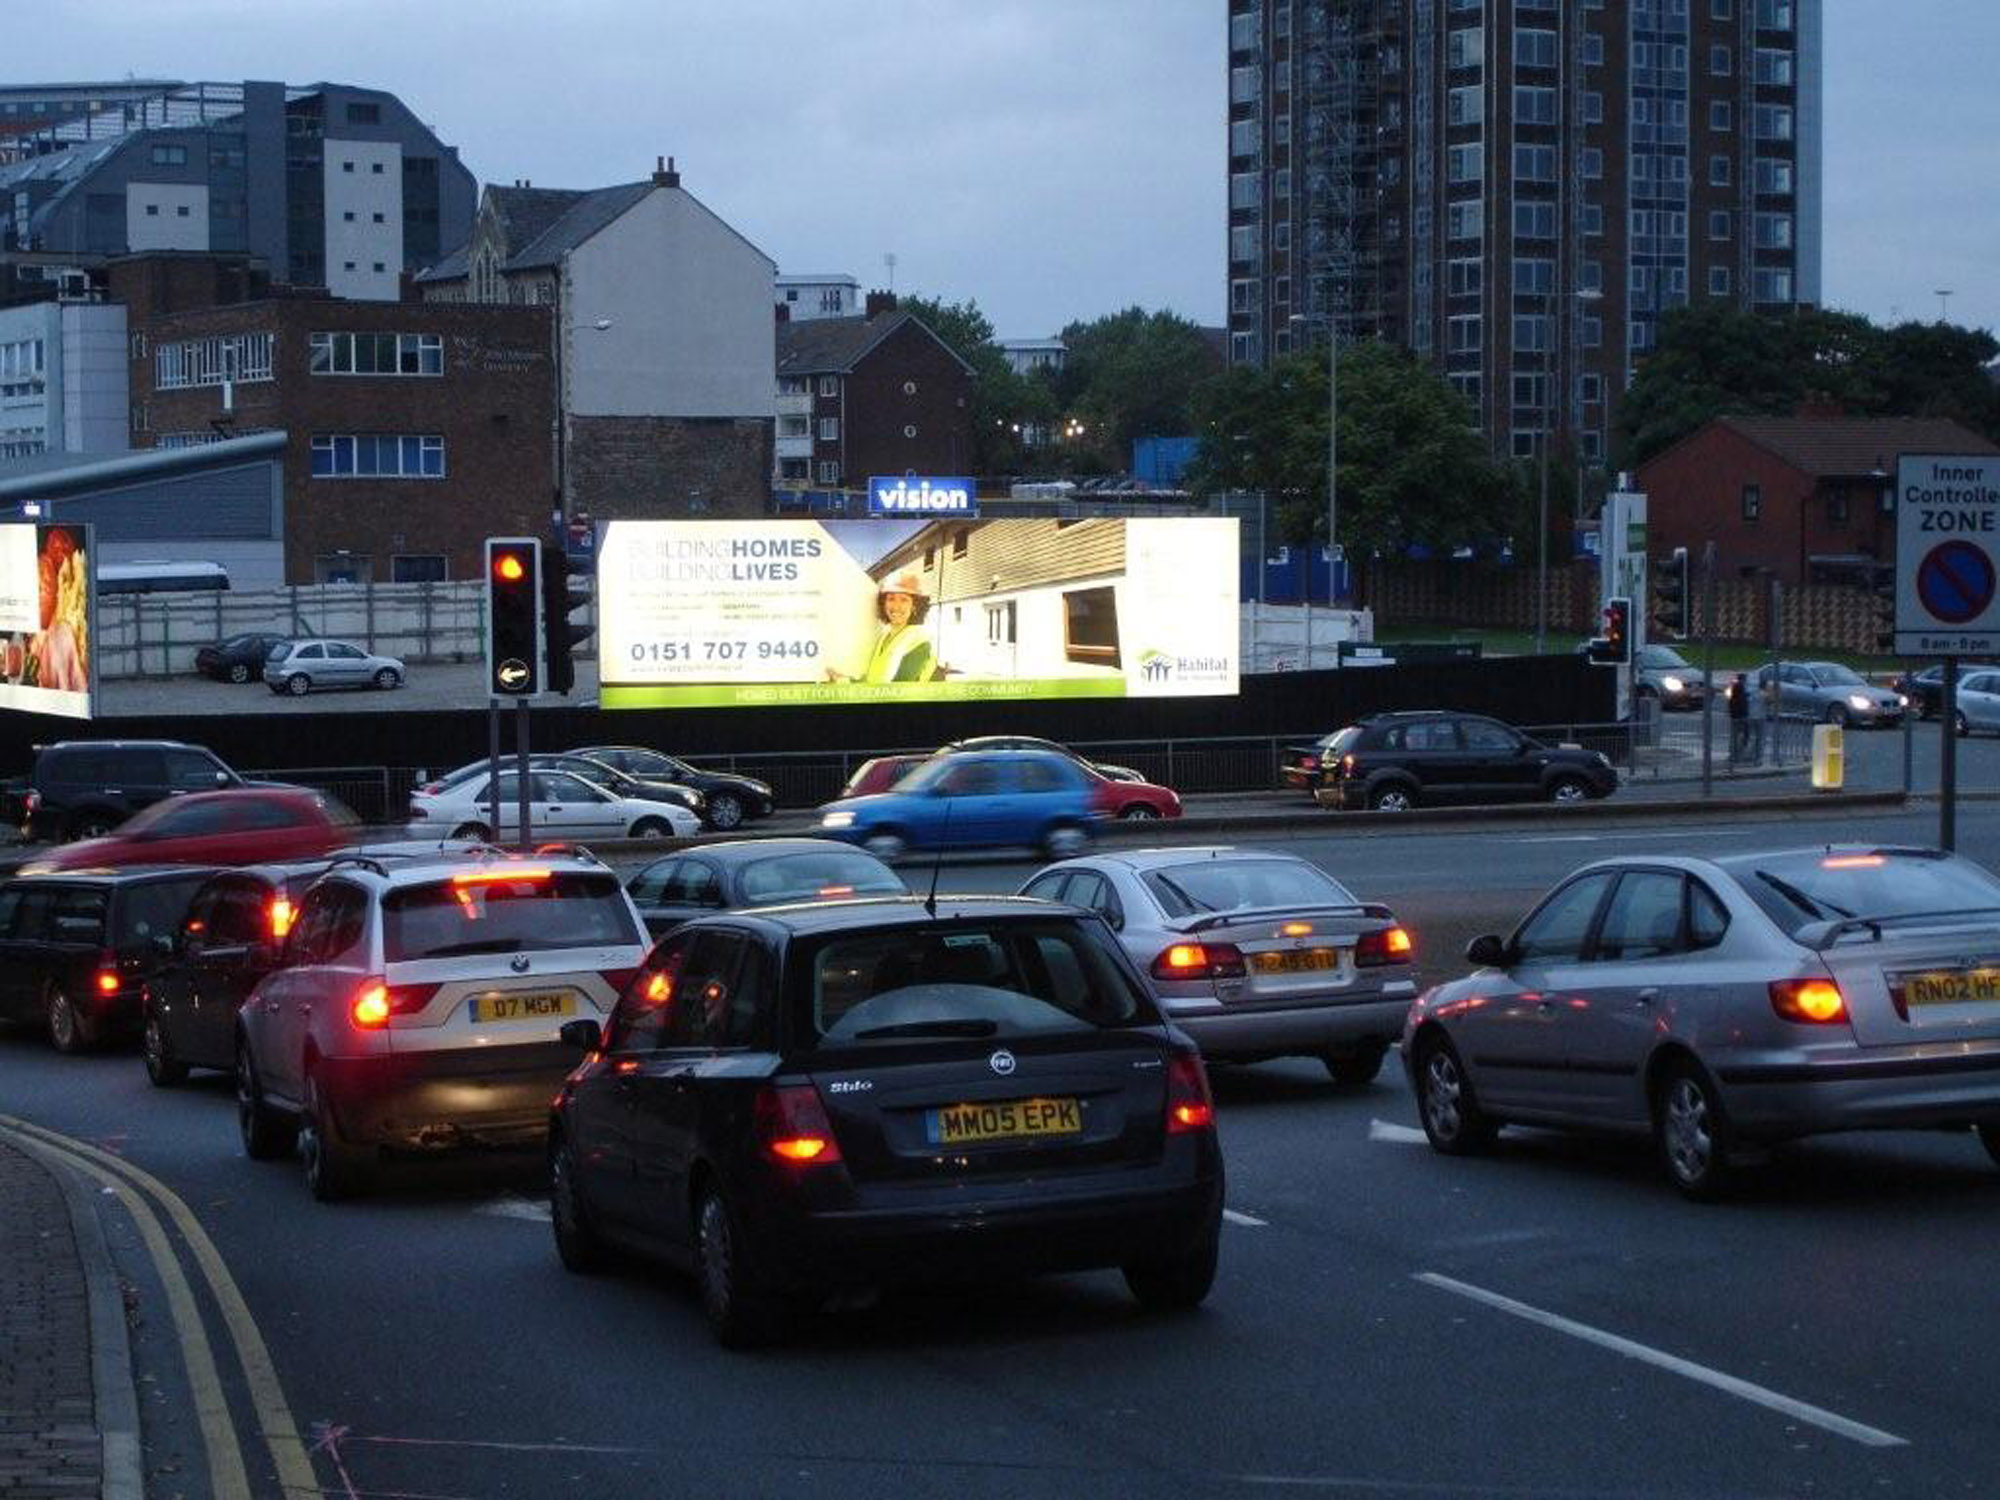 Illuminated ad unit in Manchester